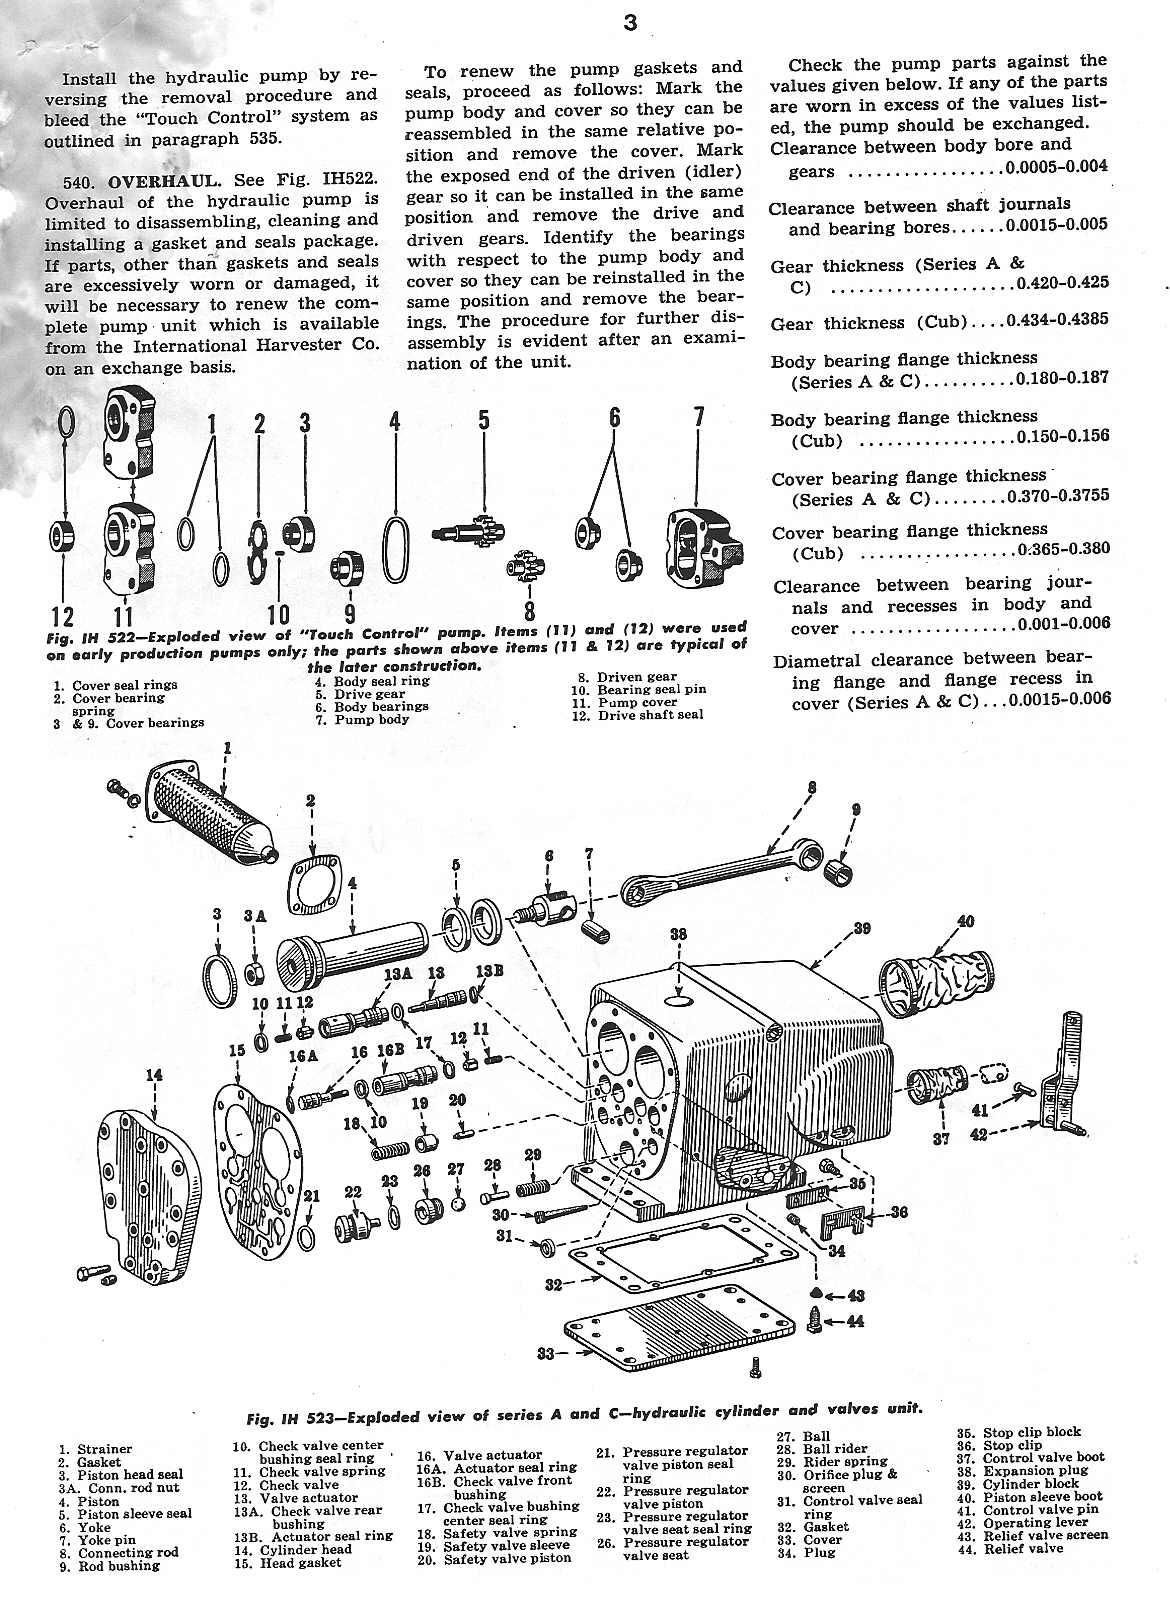 1951 farmall m wiring diagram 12 volt dc relay hydraulics quit working page 3 cub